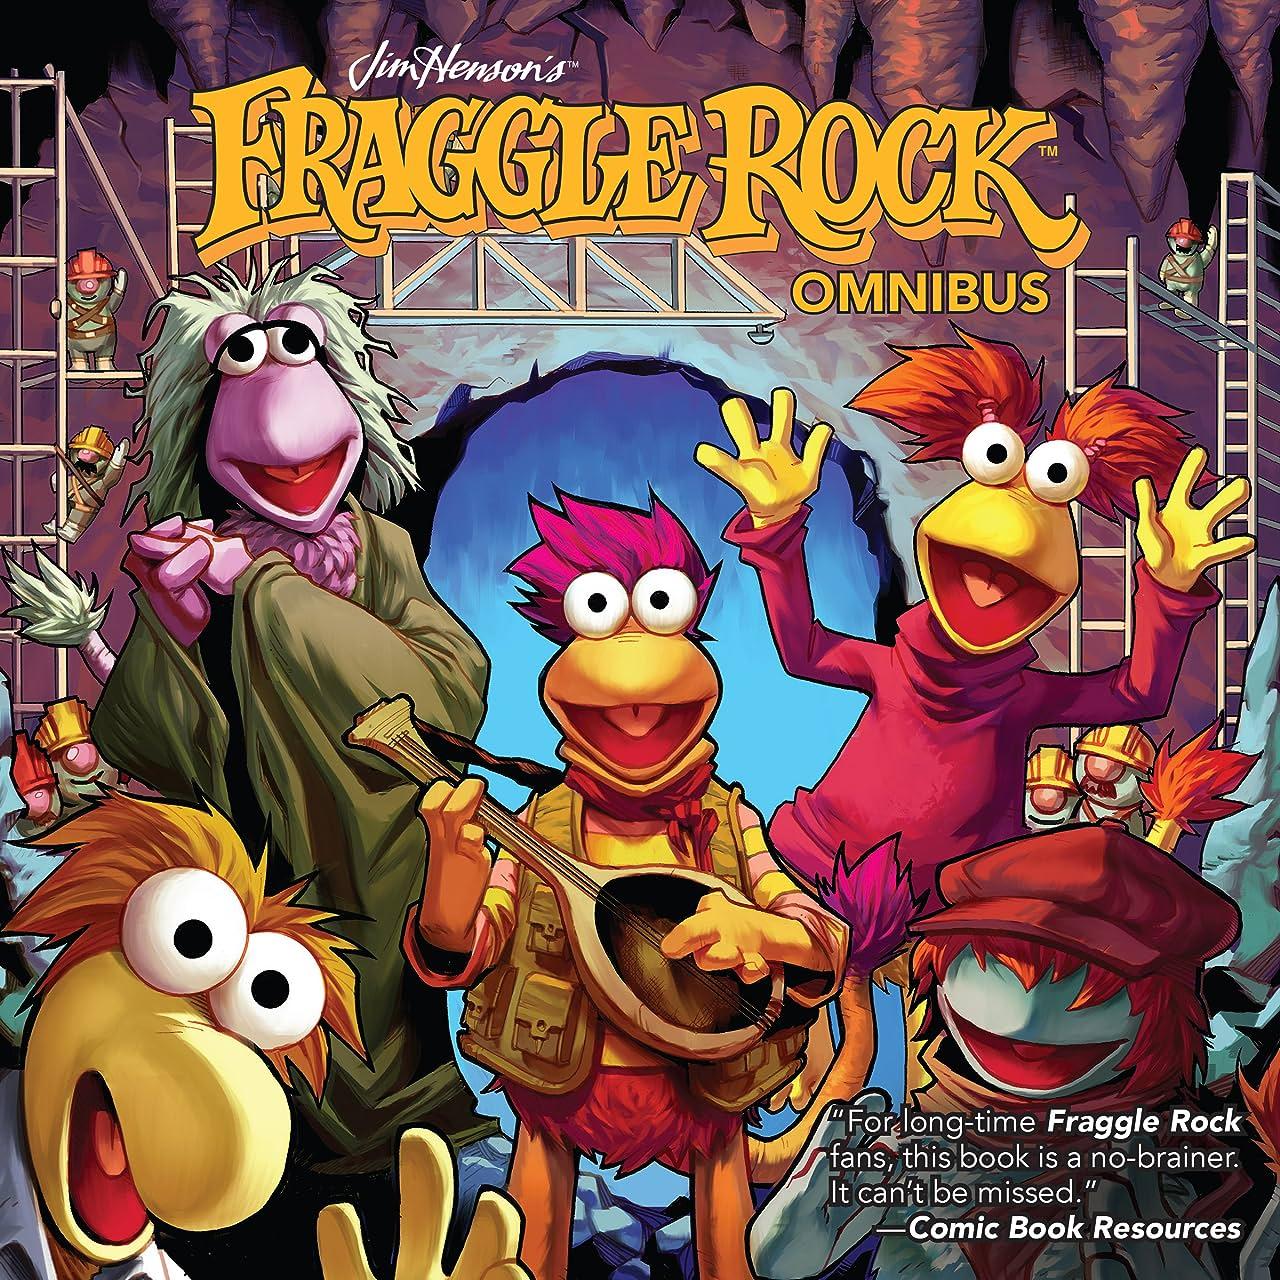 Fraggle Rock Omnibus